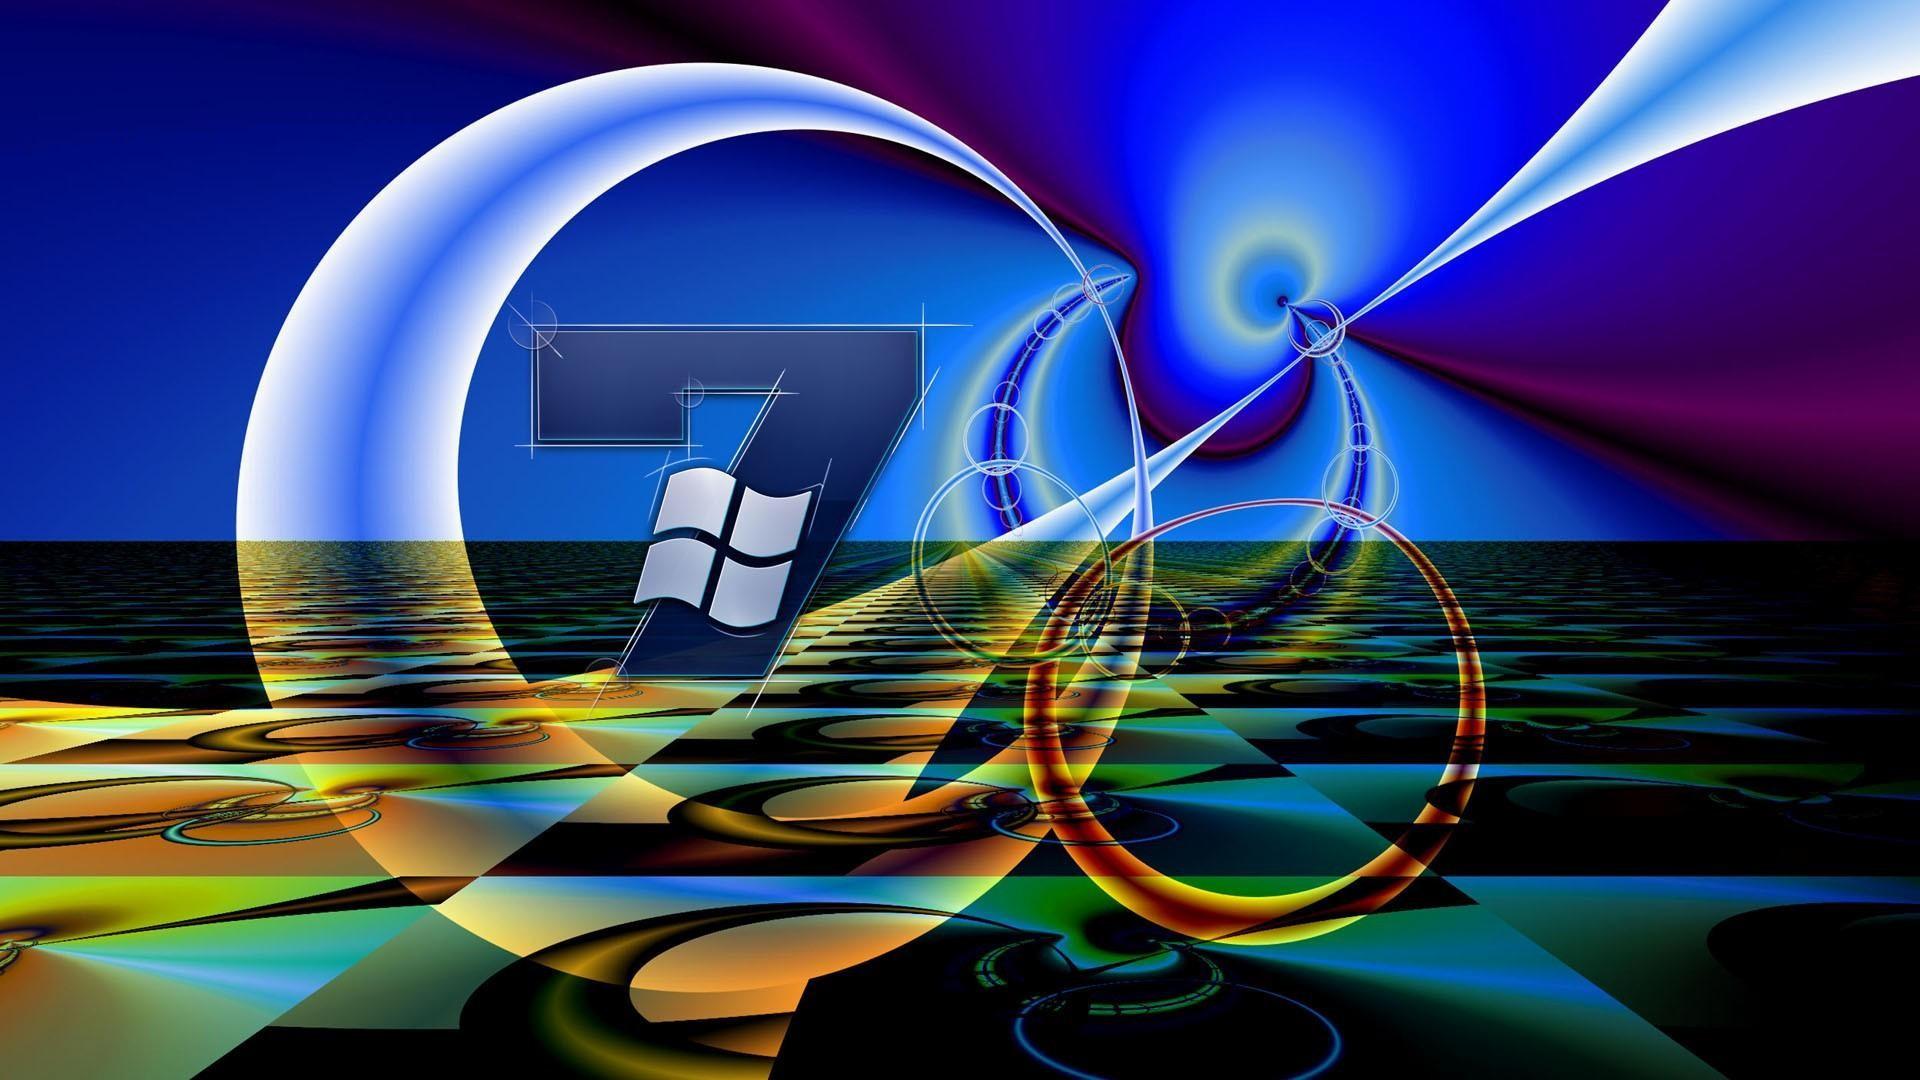 … windows 7 wallpaper themes hd …